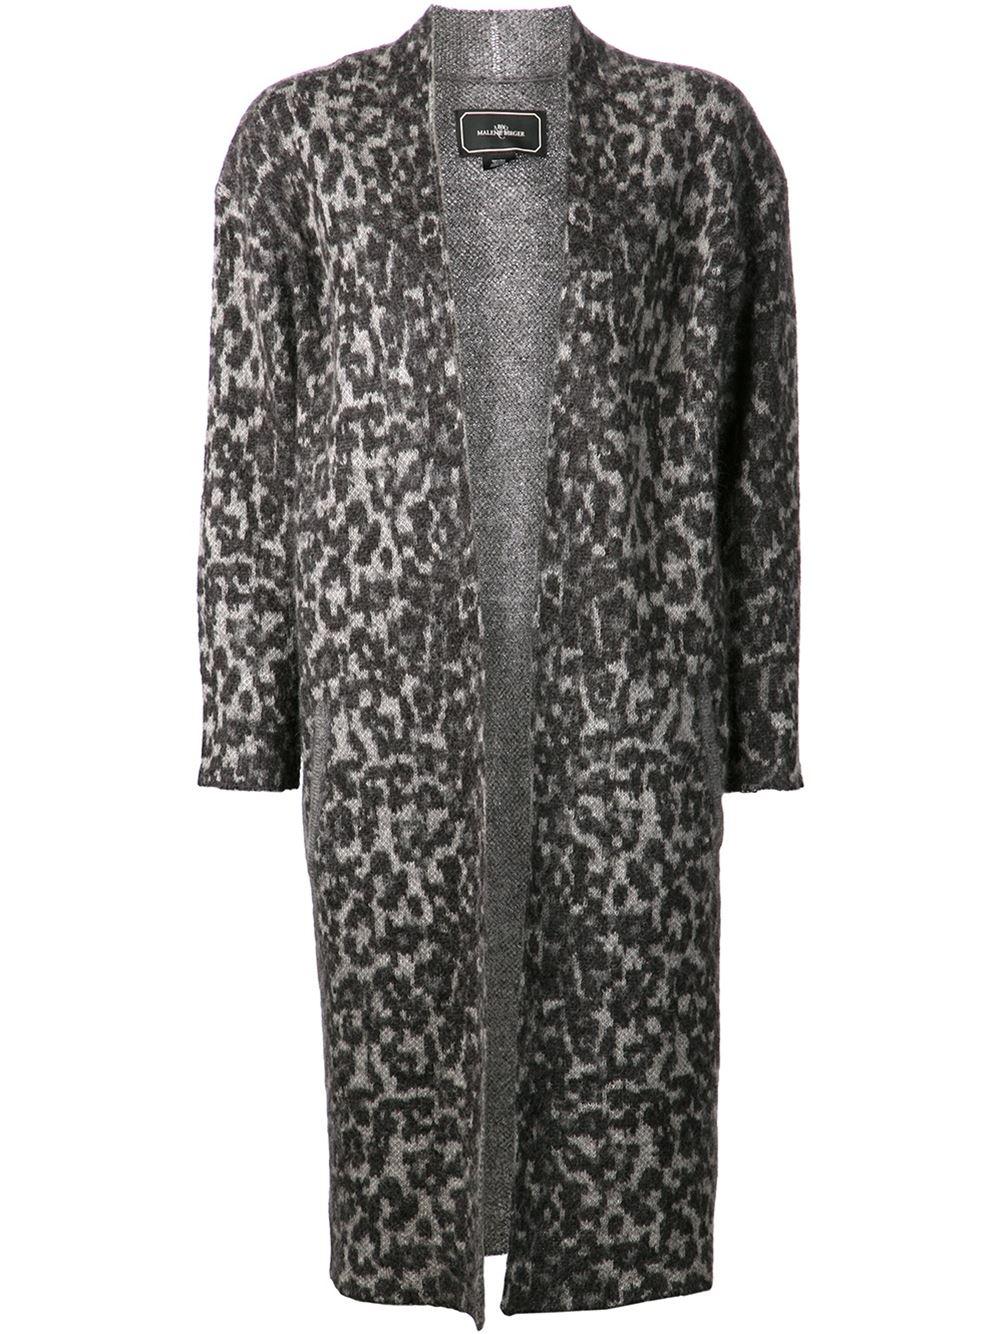 bbff9cf3dbe0 By Malene Birger Cameliu Leopard Cardigan in Gray - Lyst